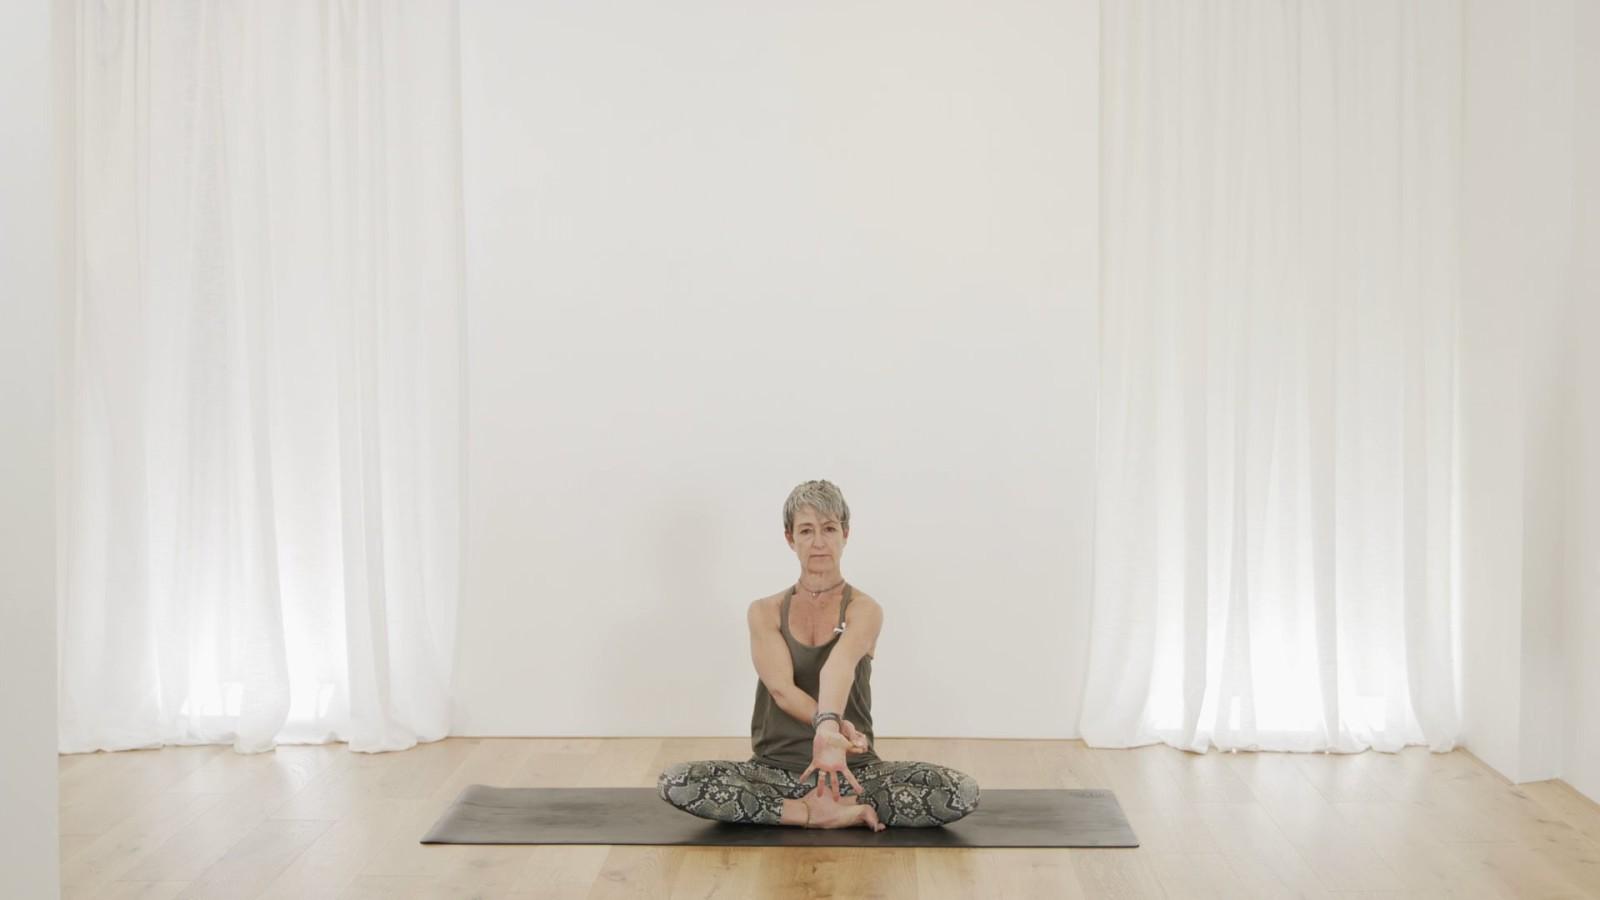 Wrist Stretches Mini Tutorial with Beth Borowsky